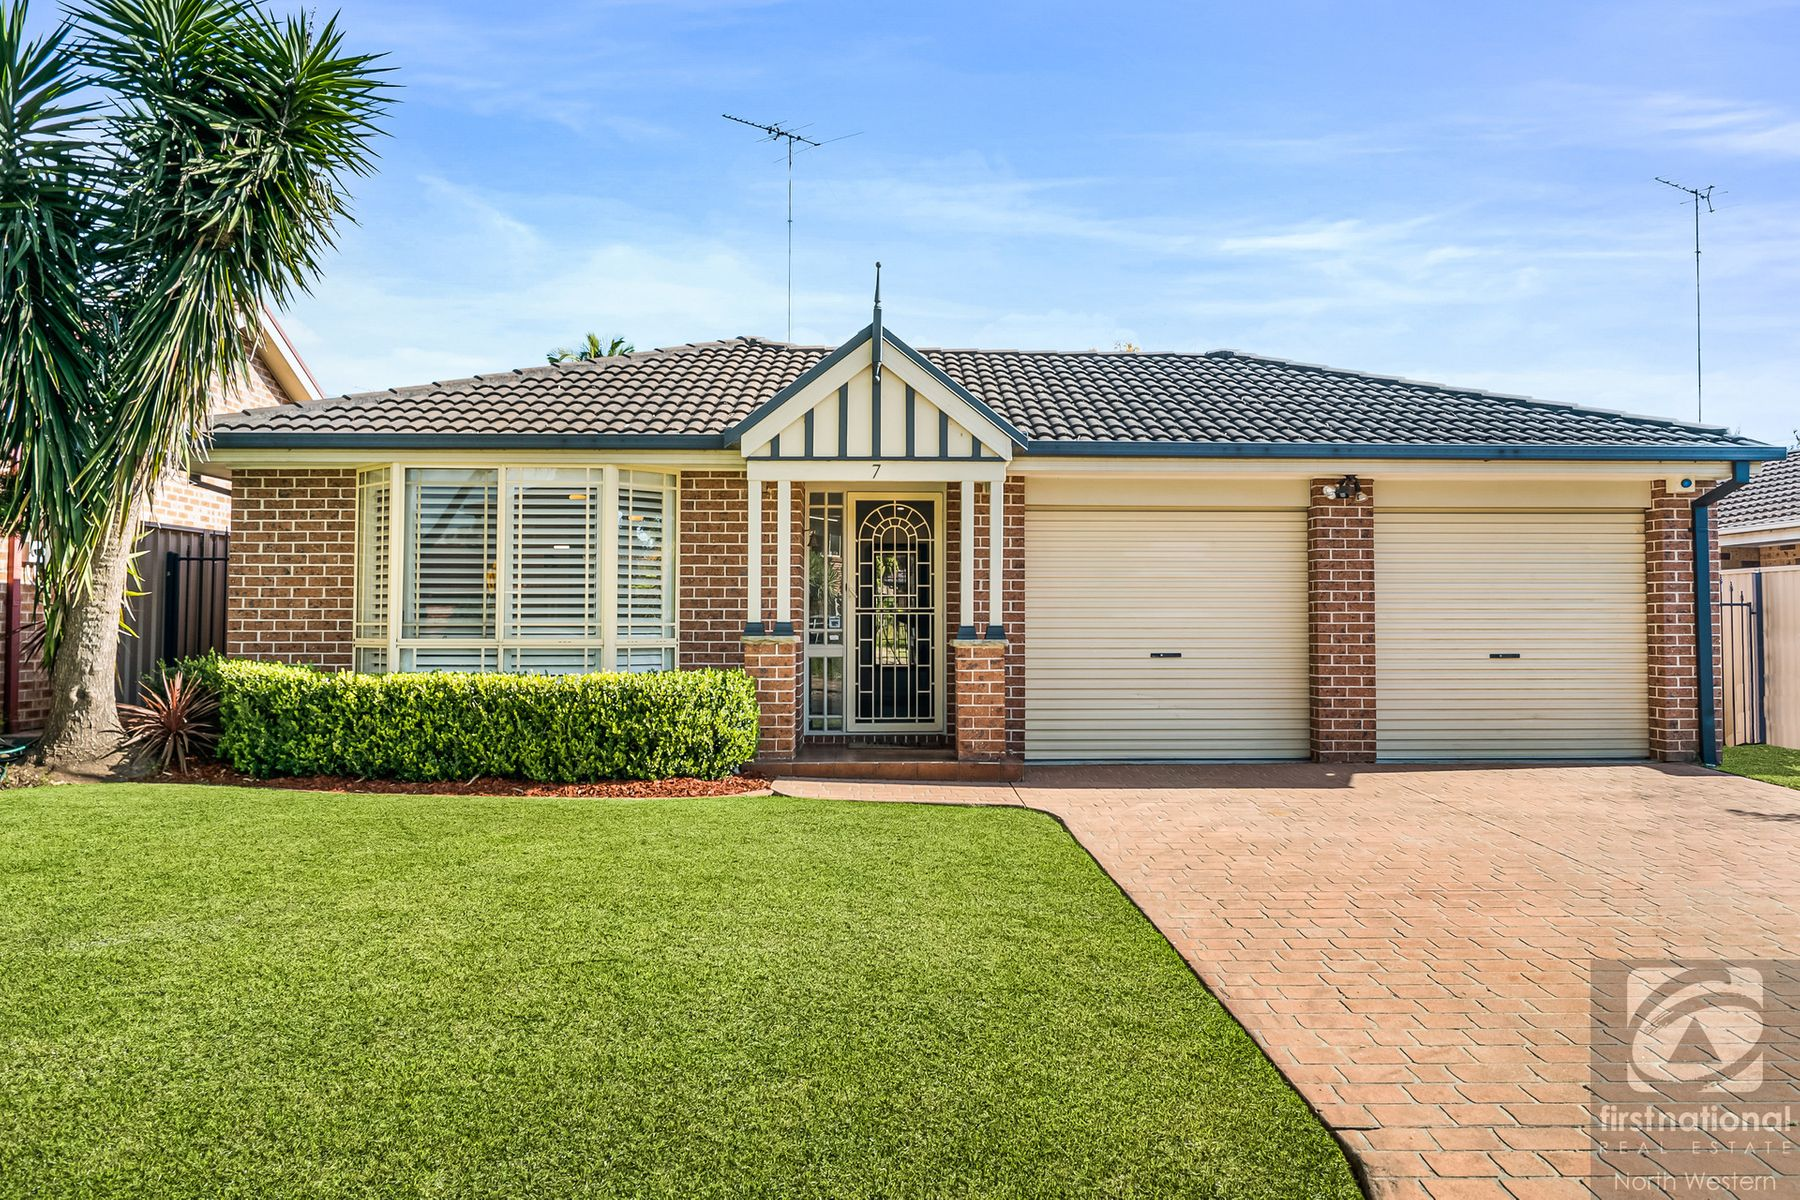 7 Ponytail Drive, Stanhope Gardens, NSW 2768